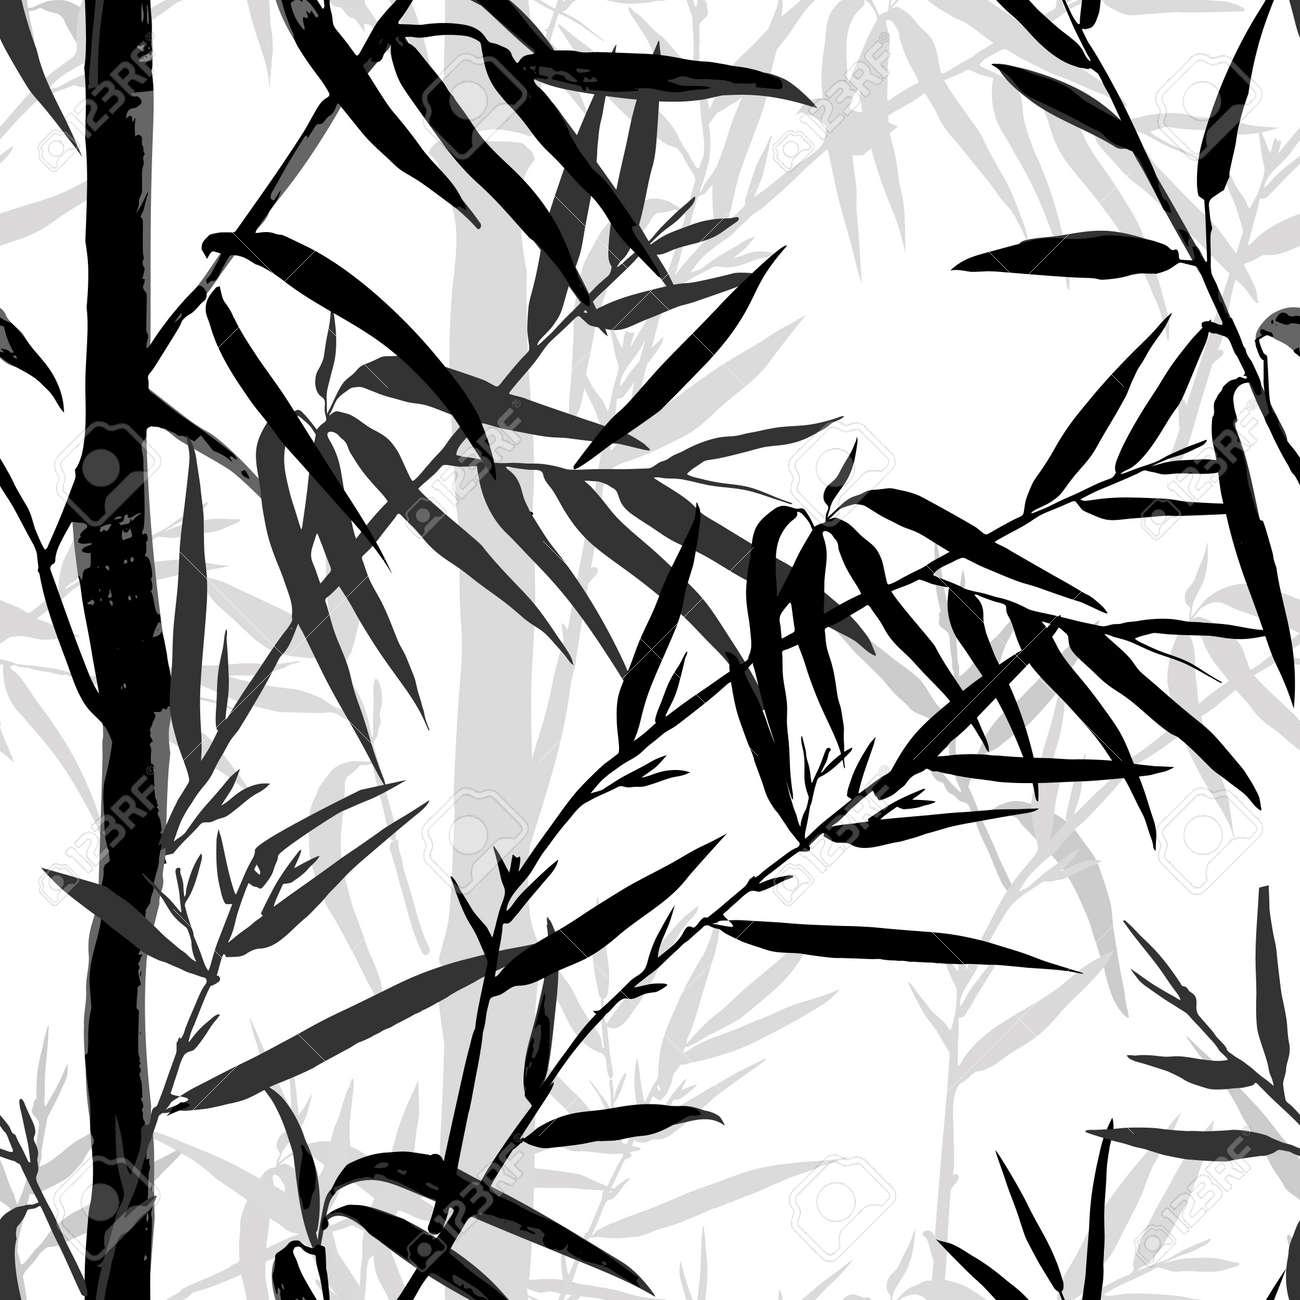 Charmant Draht Ahornblatt Muster Galerie - Schaltplan Serie Circuit ...